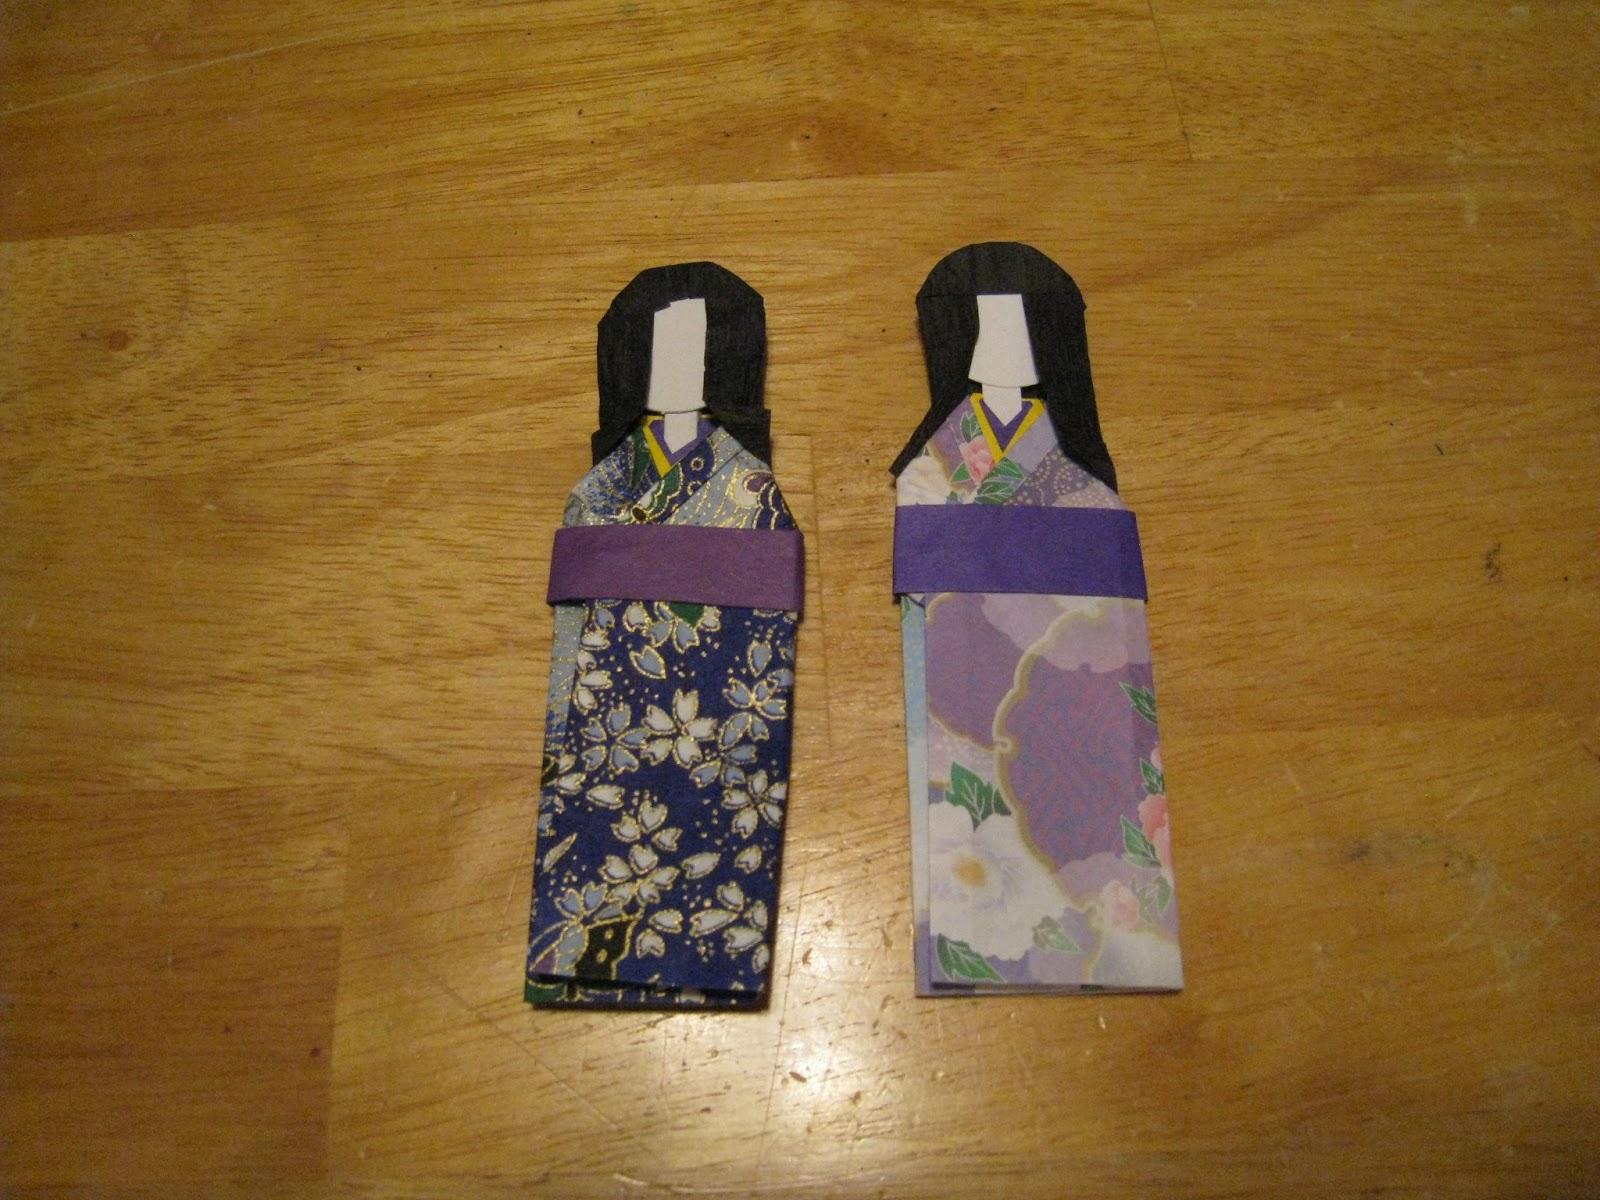 Japanese Paper Dolls Crafts 4 Camp Japanese